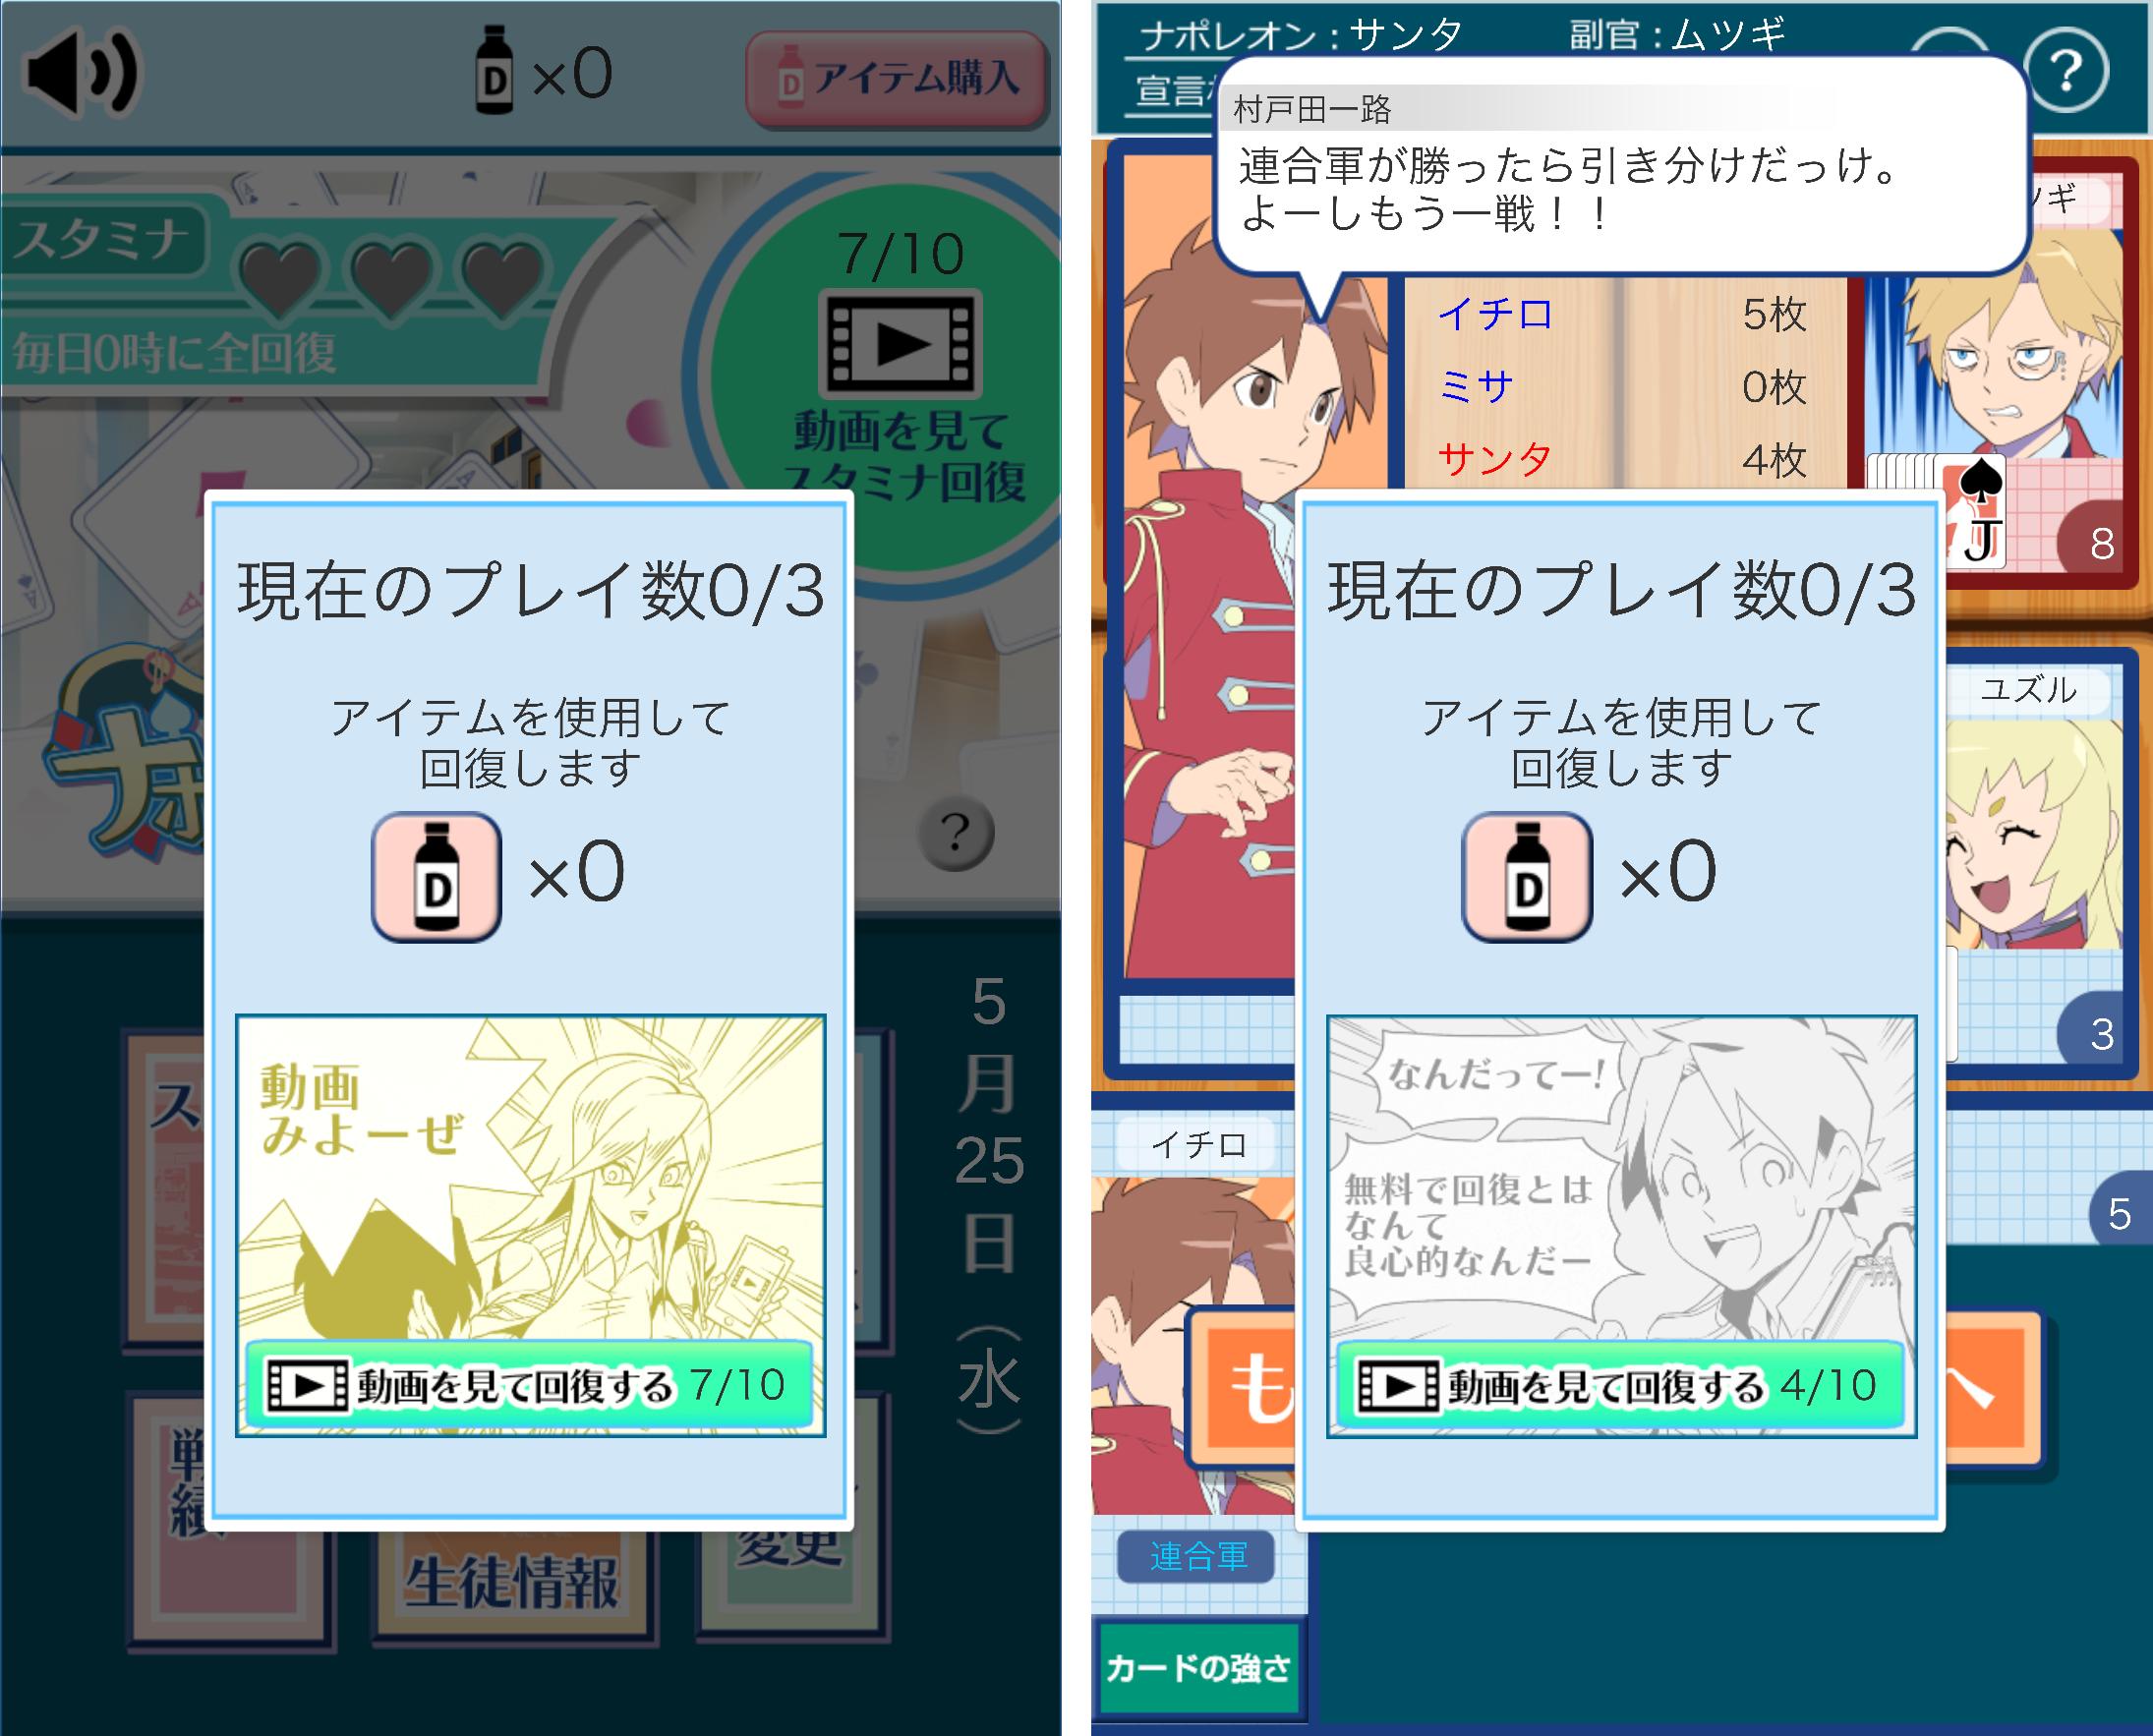 androidアプリ 日直争奪ナポレオン学園(トランプゲーム)攻略スクリーンショット5